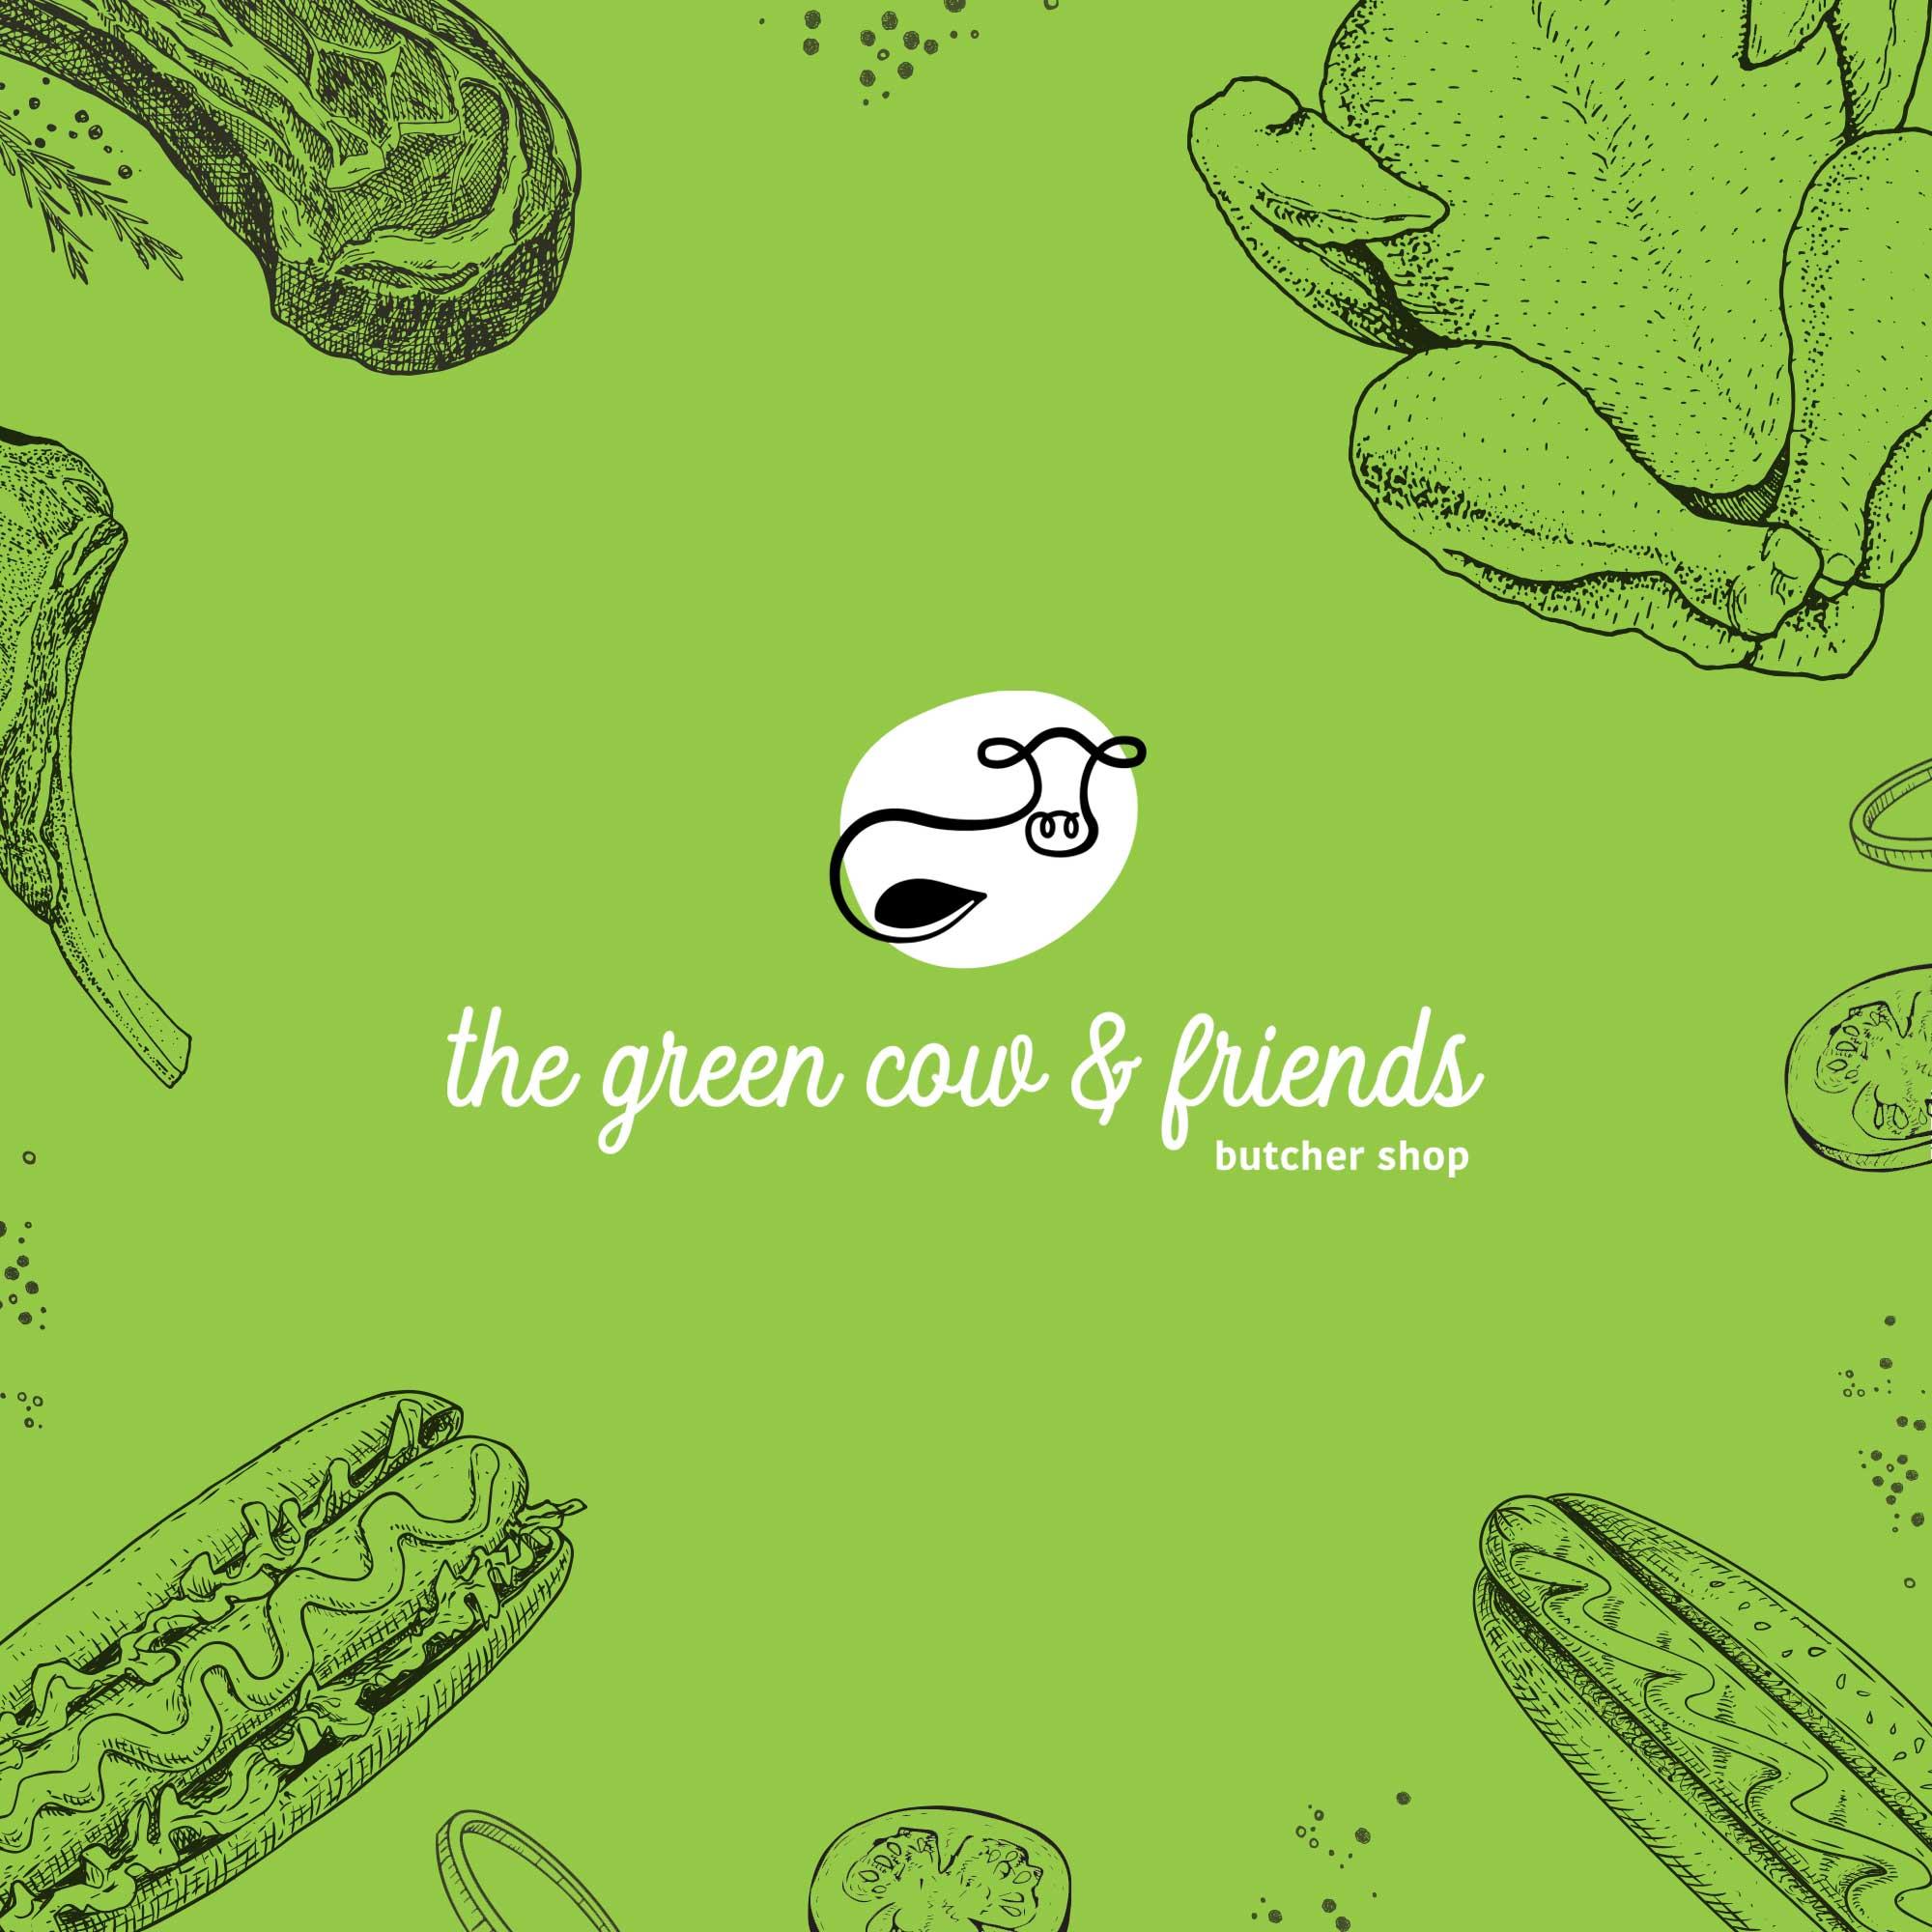 Green Cow & Friends Butcher Shop